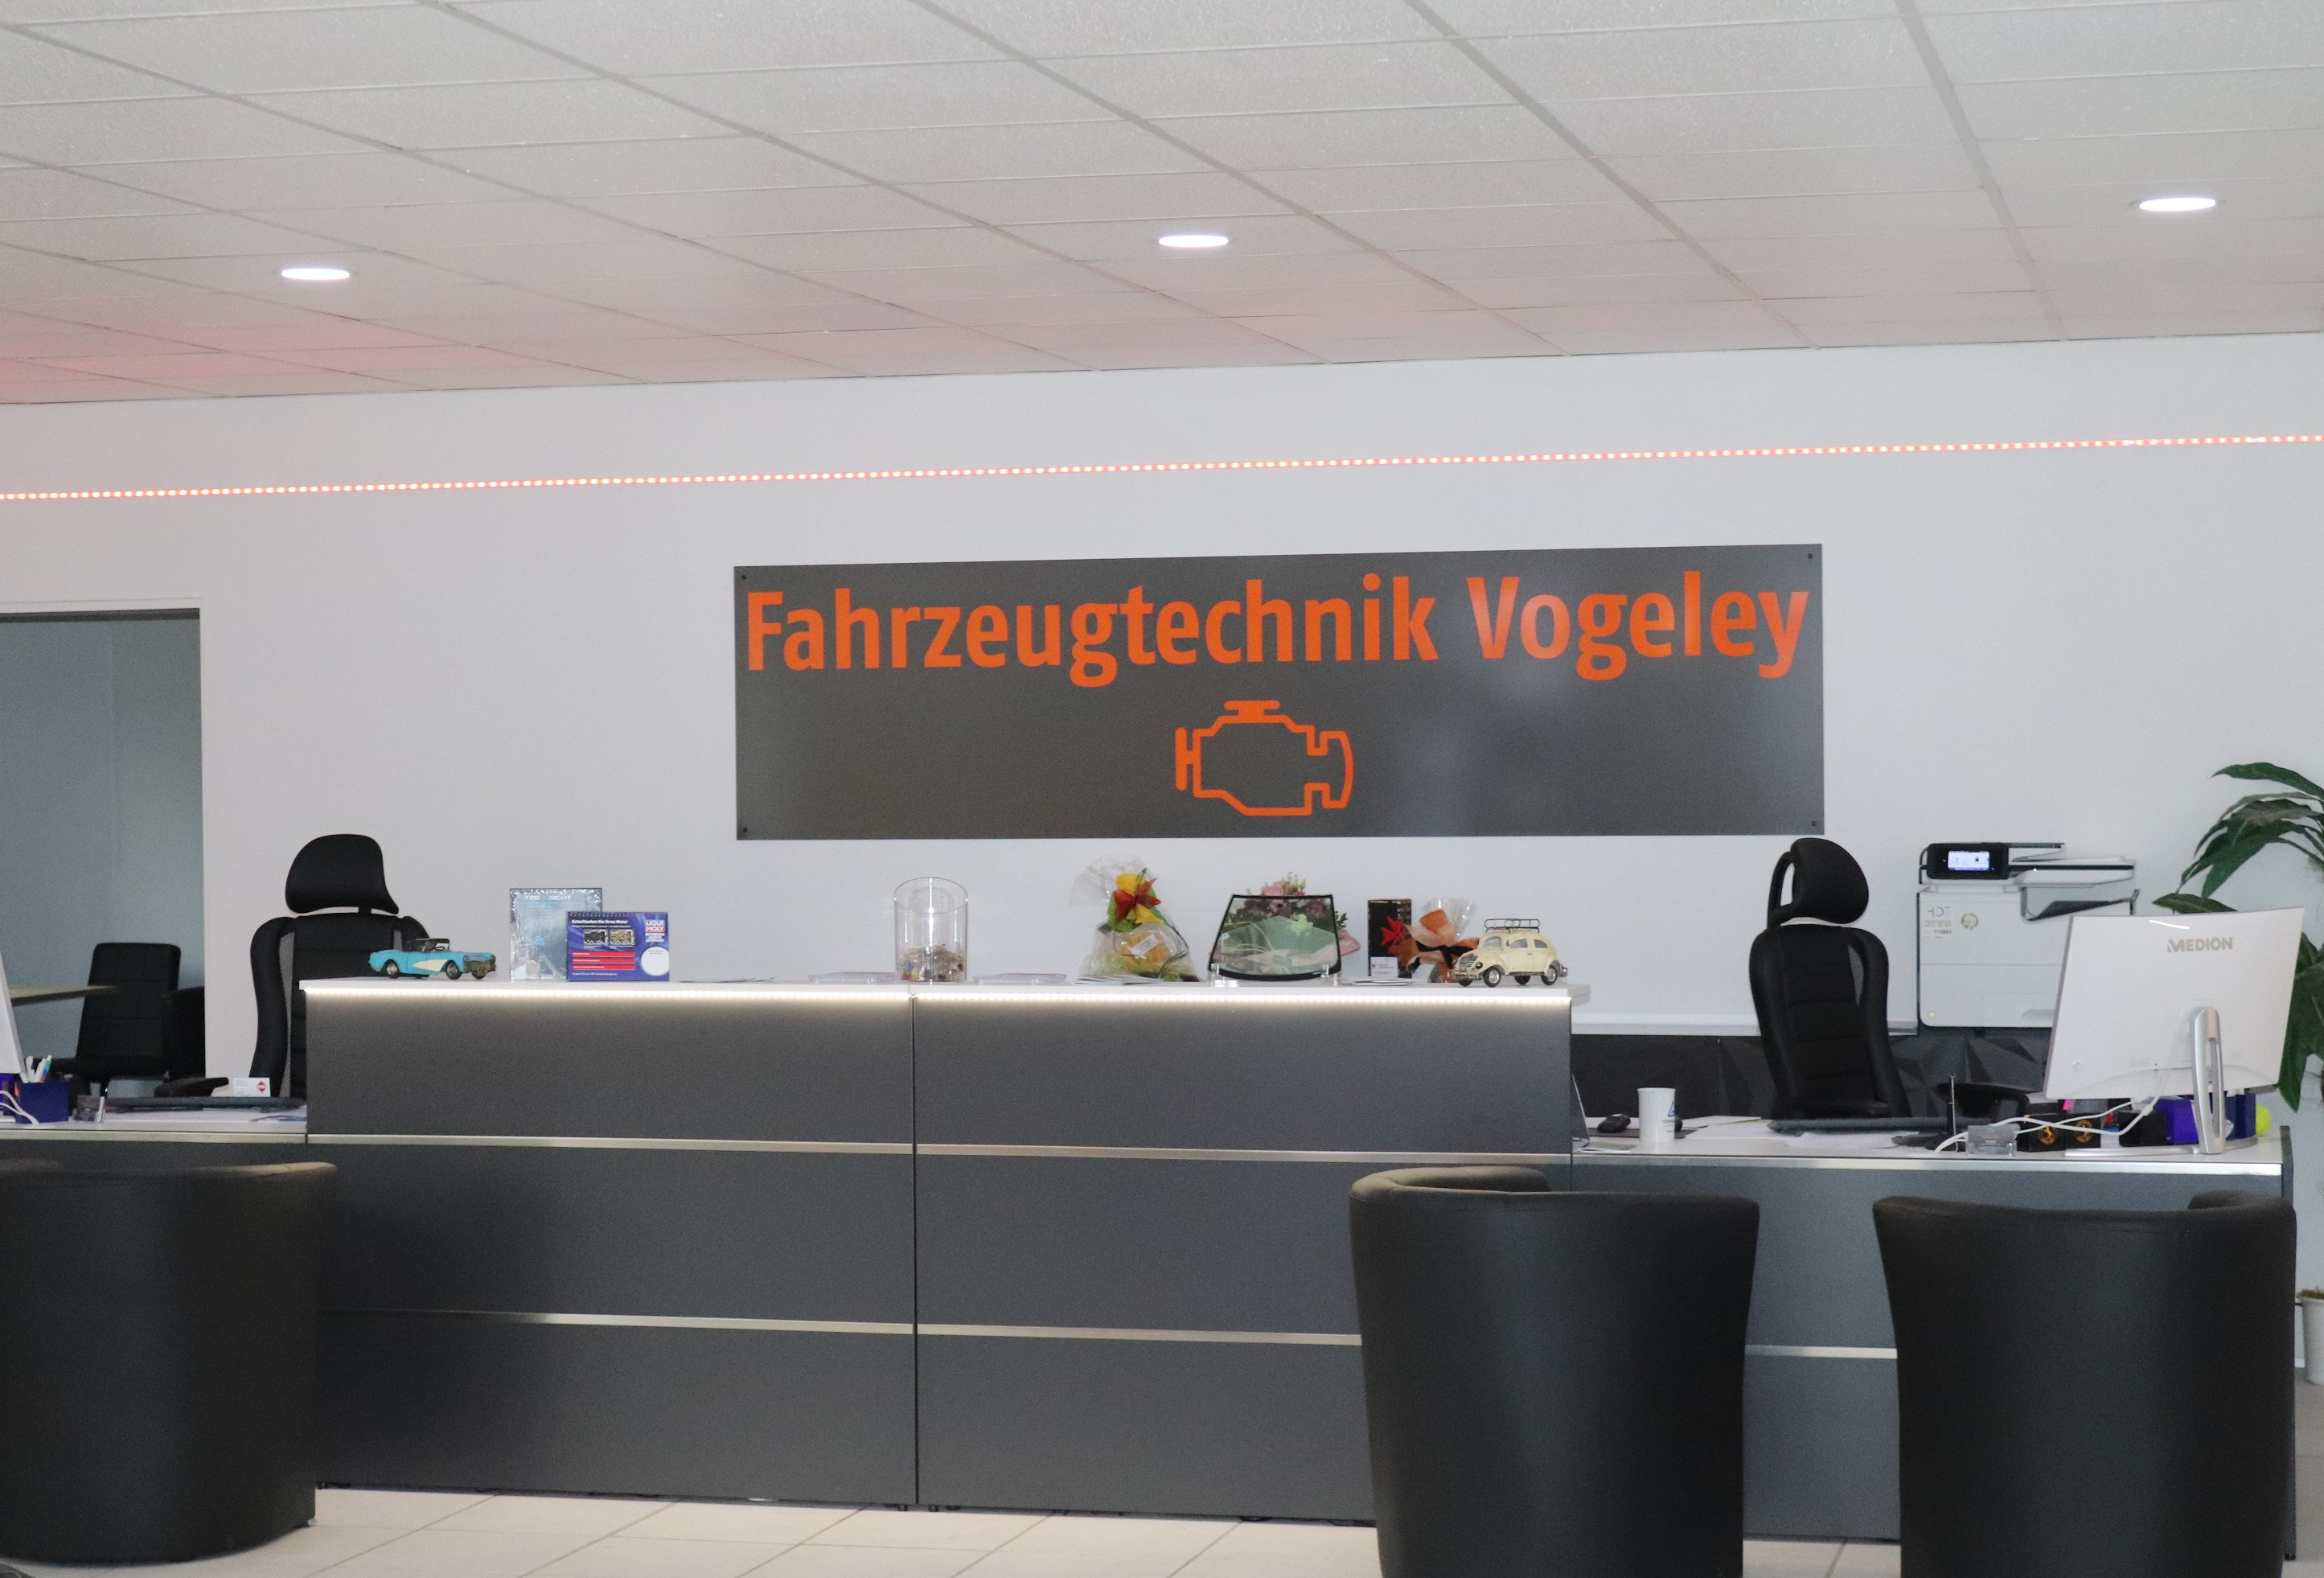 Fahrzeugtechnik-Vogeley GmbH